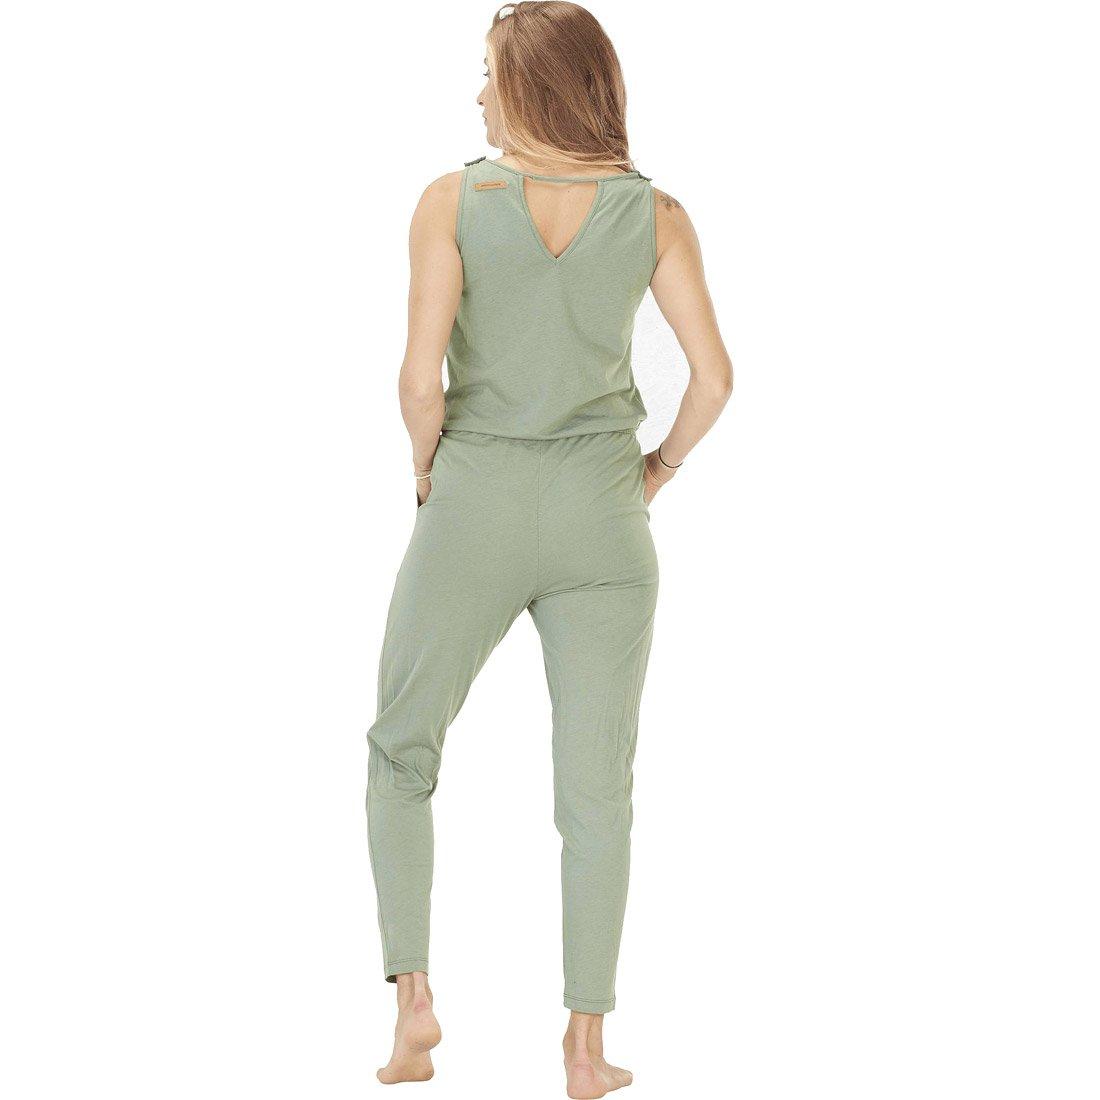 סרבל קיץ לנשים - Harper Suit - Picture Organic